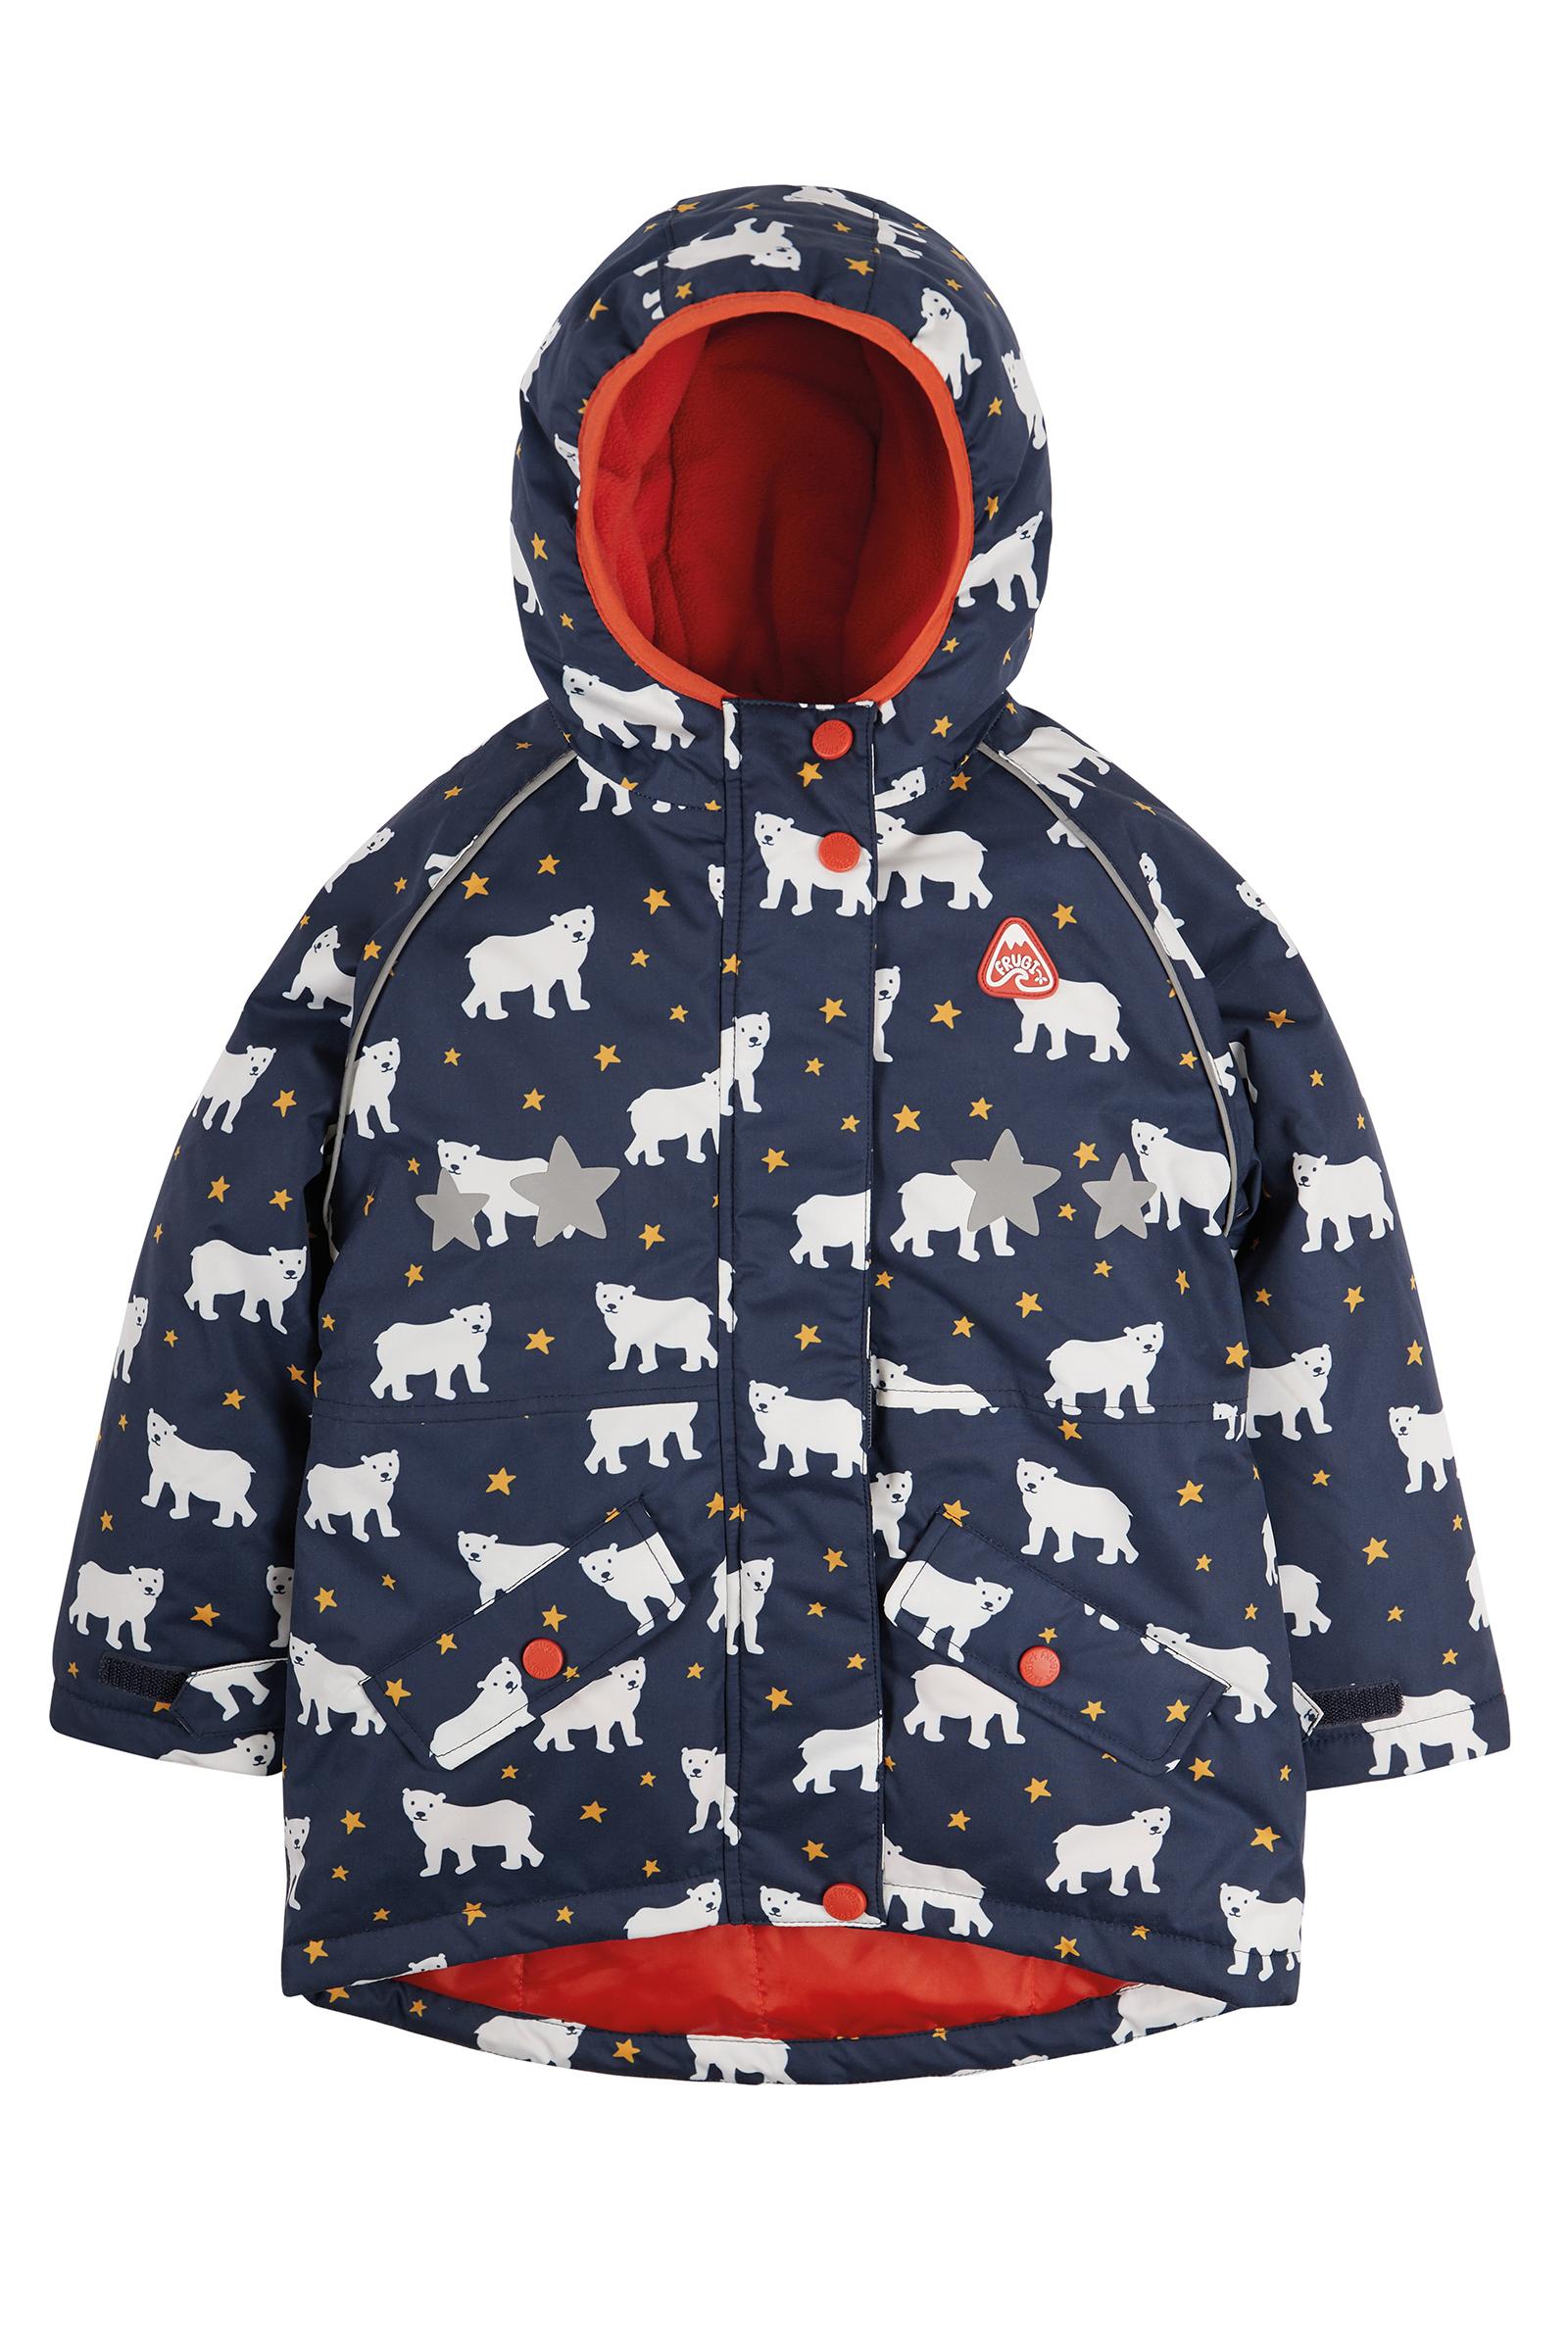 Frugi - Explorer Waterproof Coat, Polar Bears